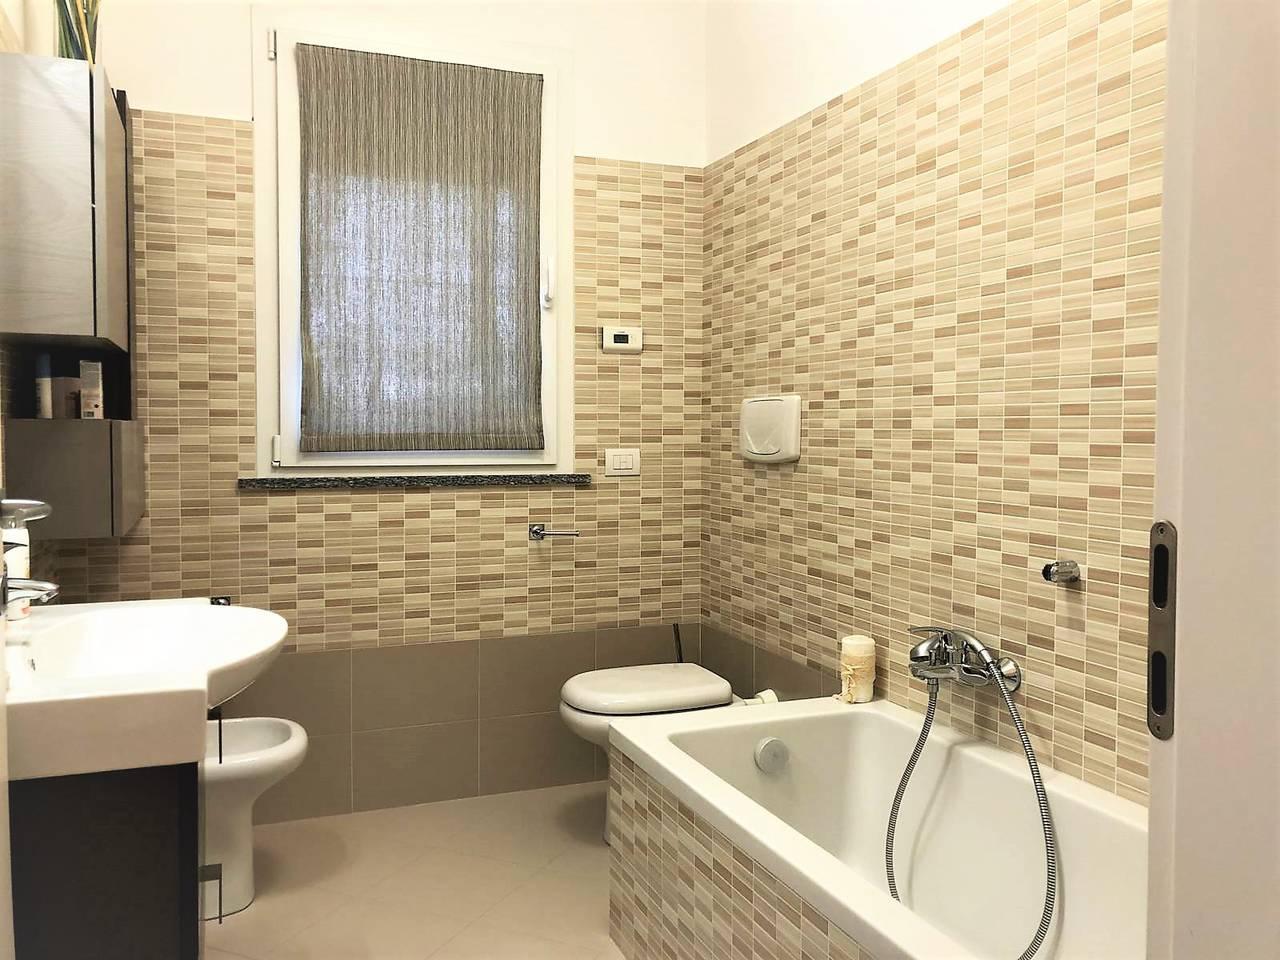 Appartamento-in-vendita-a-Busnago-in-Brianza-17